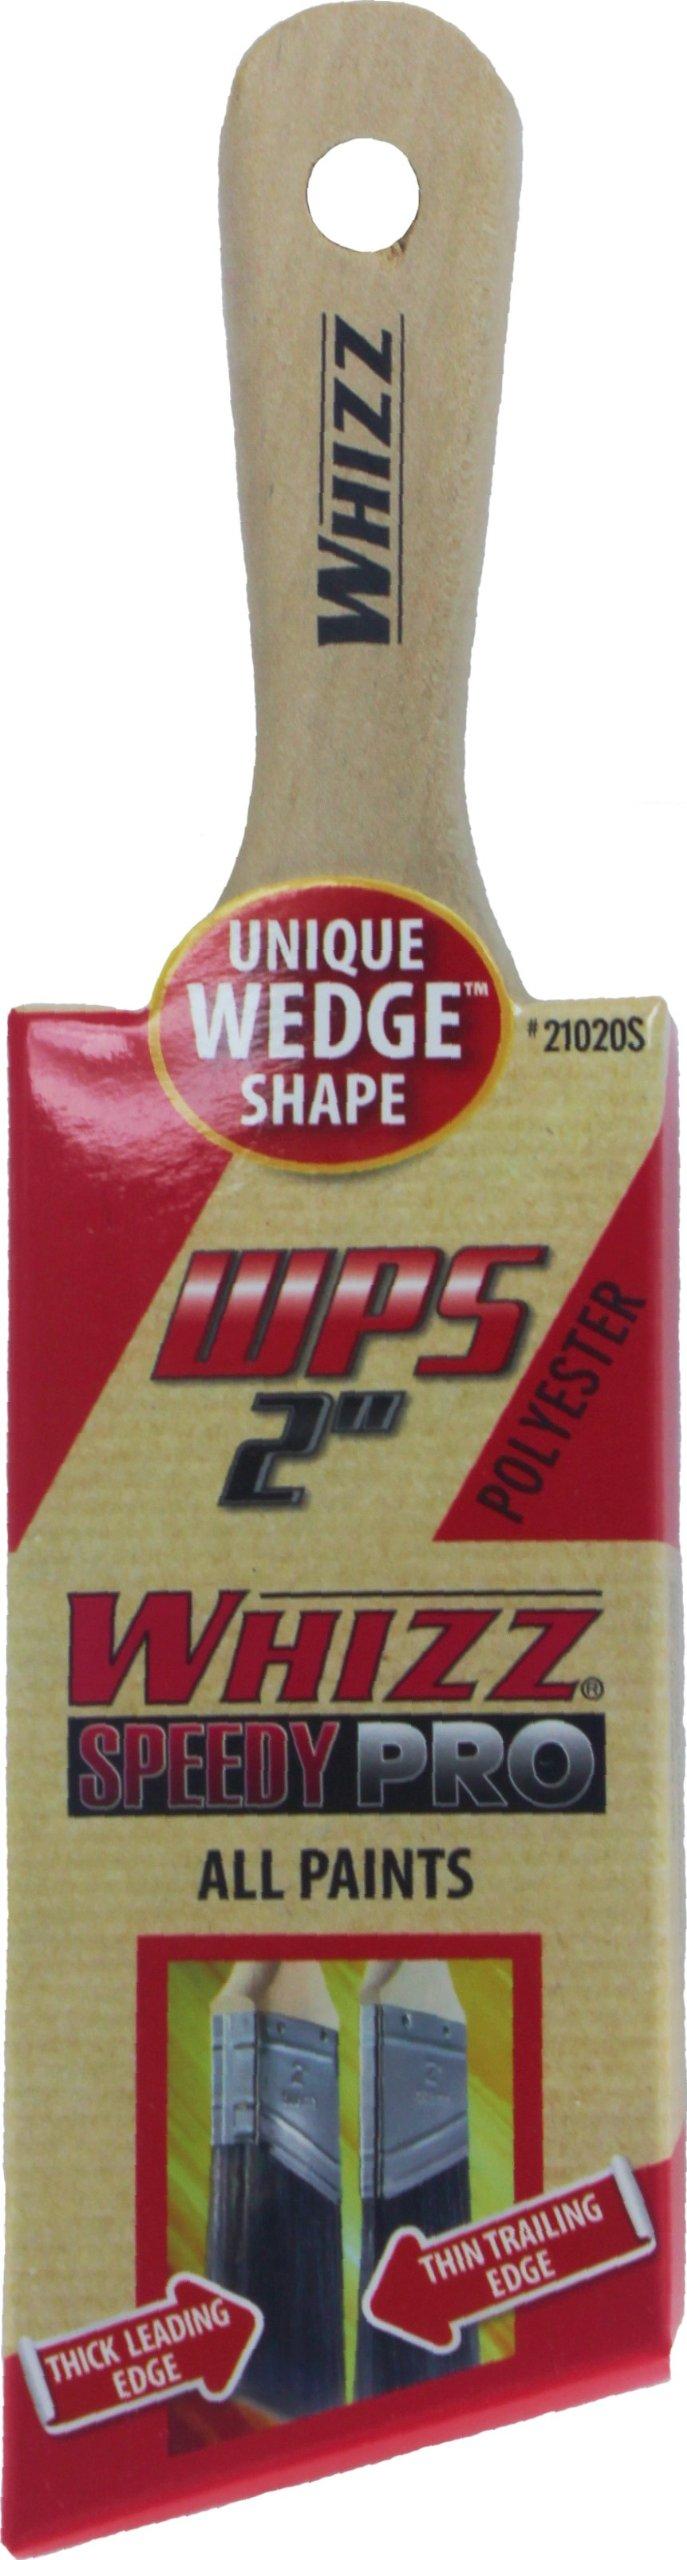 Work Tools International Inc. 21020S Speedy Pro Wedge Brush, 2-Inch